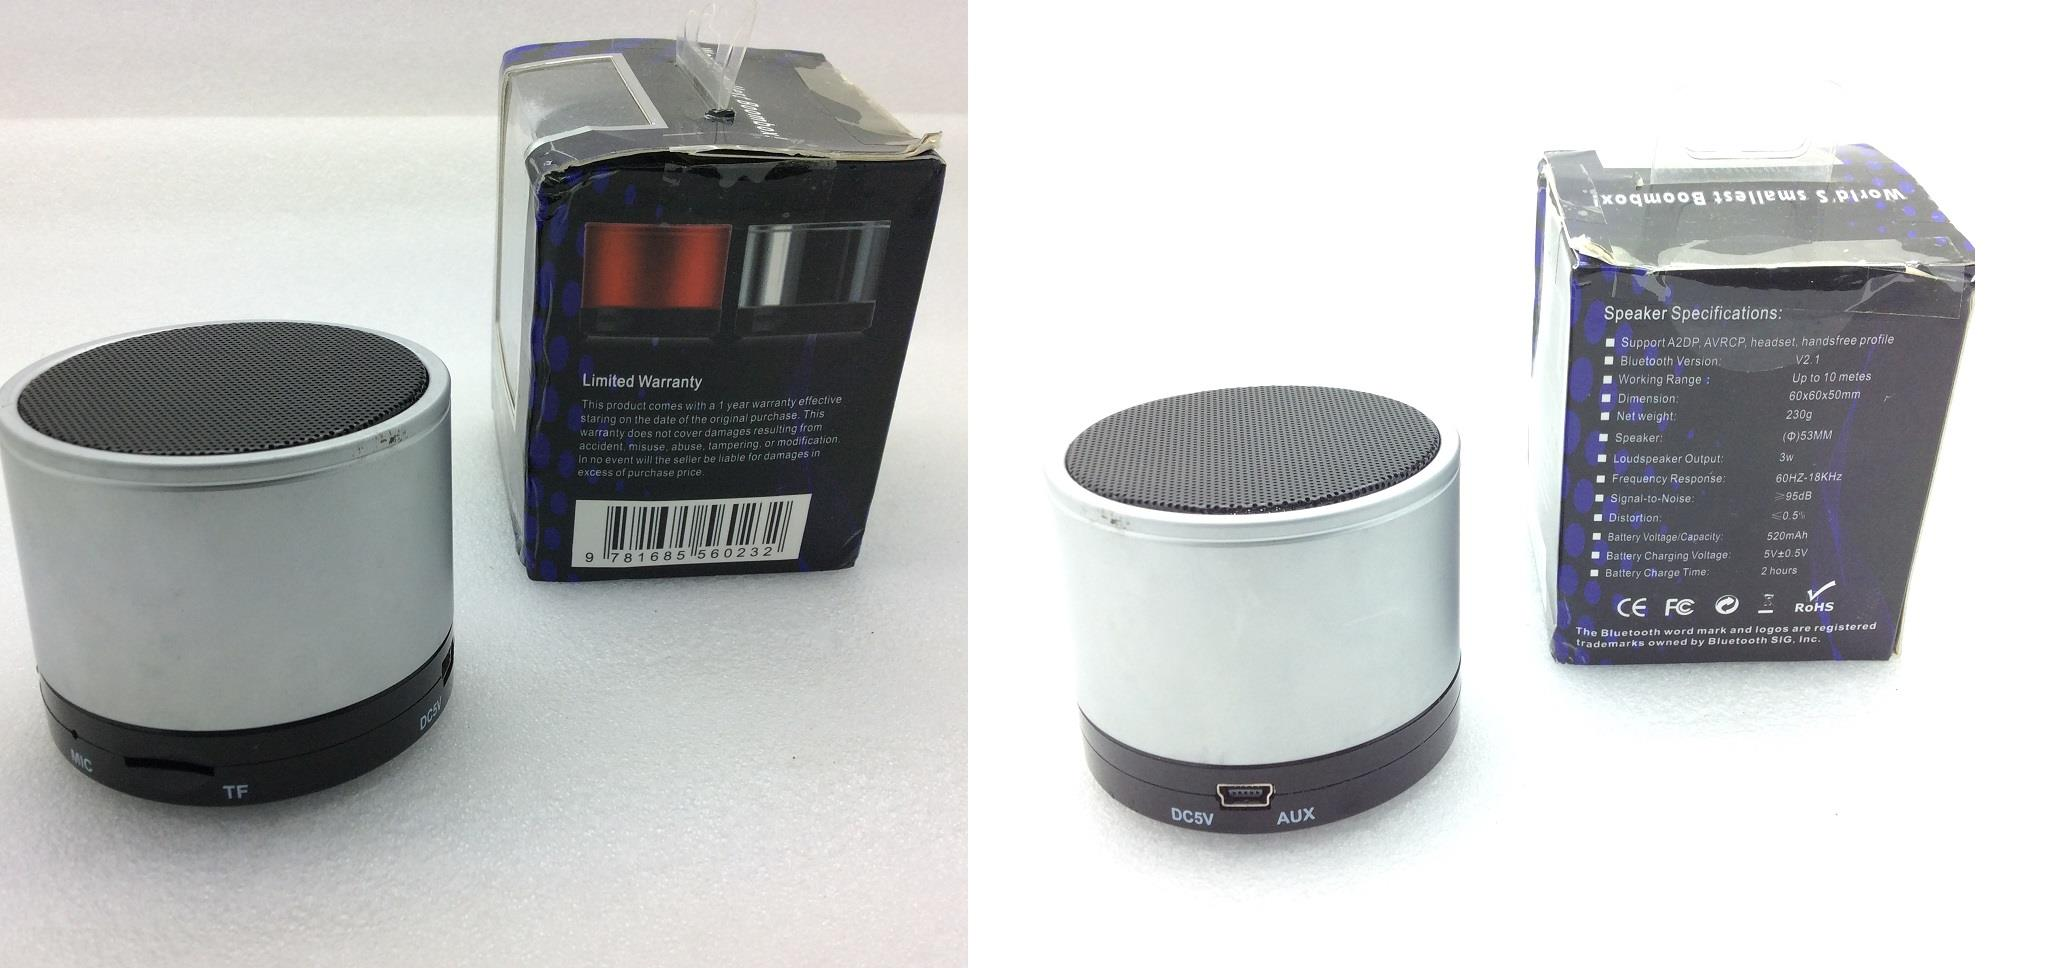 Bluetooth Speaker - World's Smallest Boombox 2